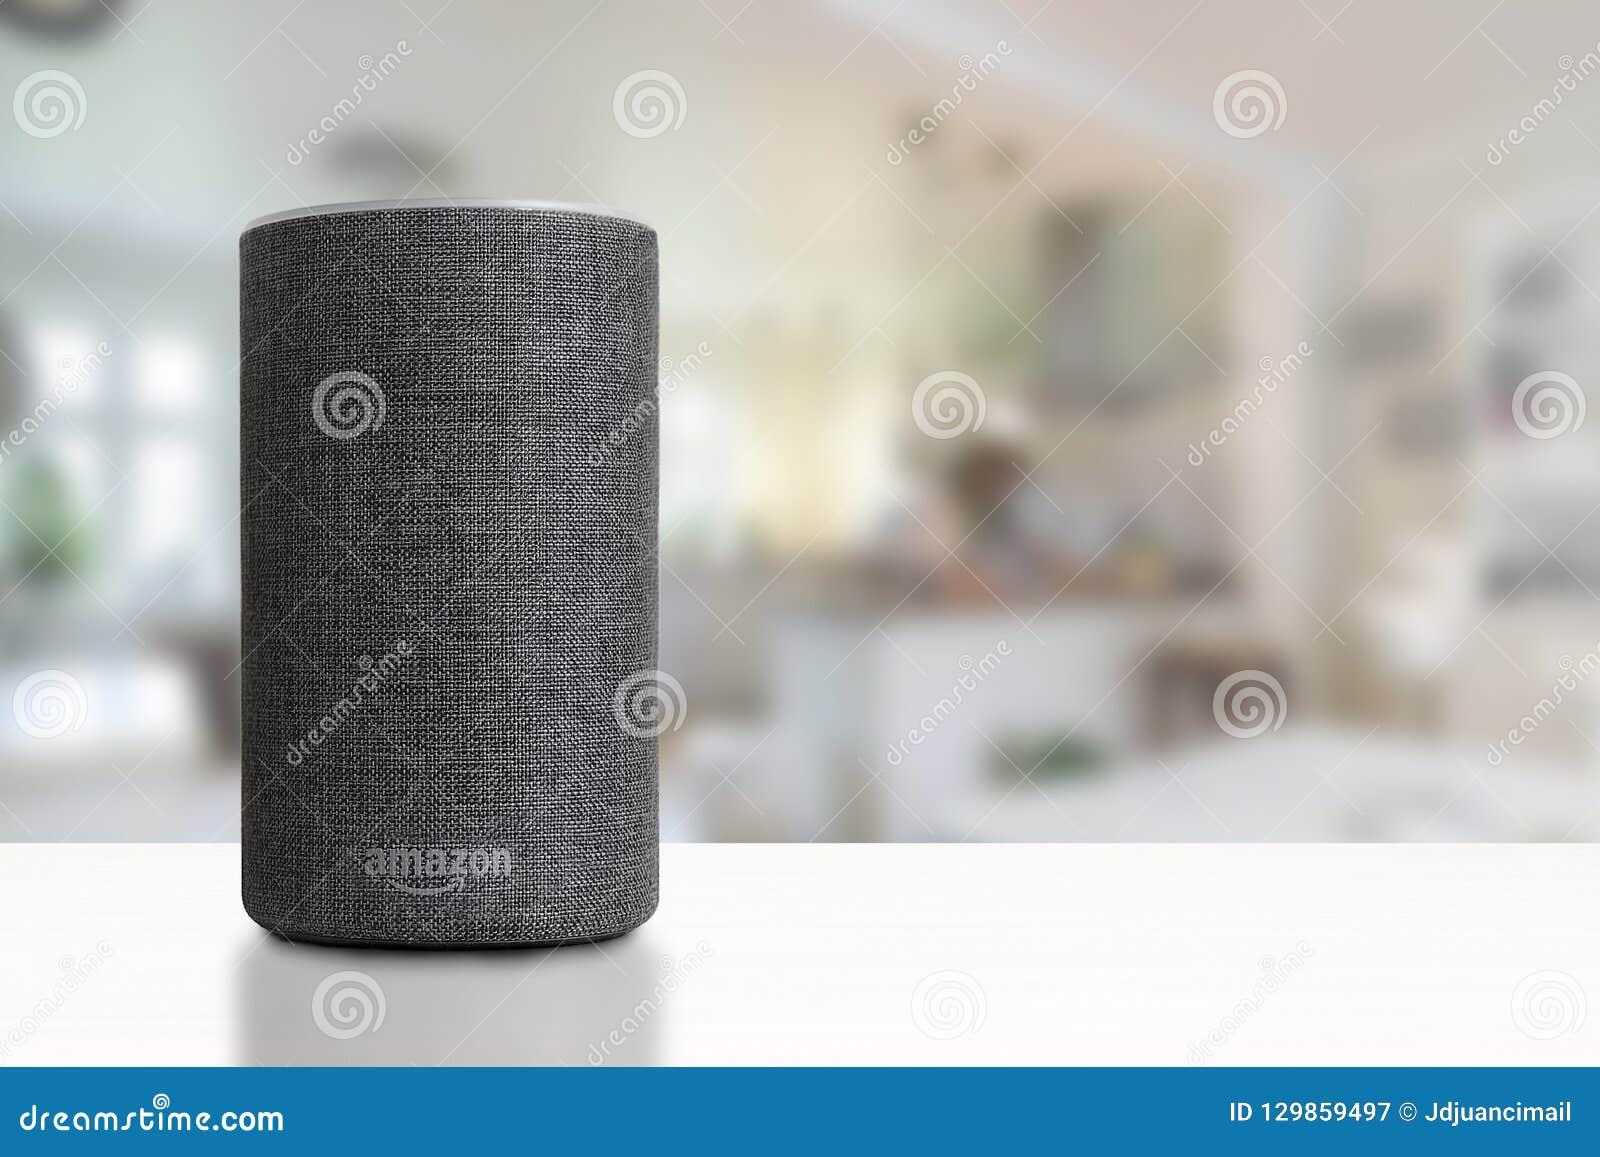 BARCELONA - OCTOBER 2018: Amazon Echo Smart Home Alexa Voice Service in a living room